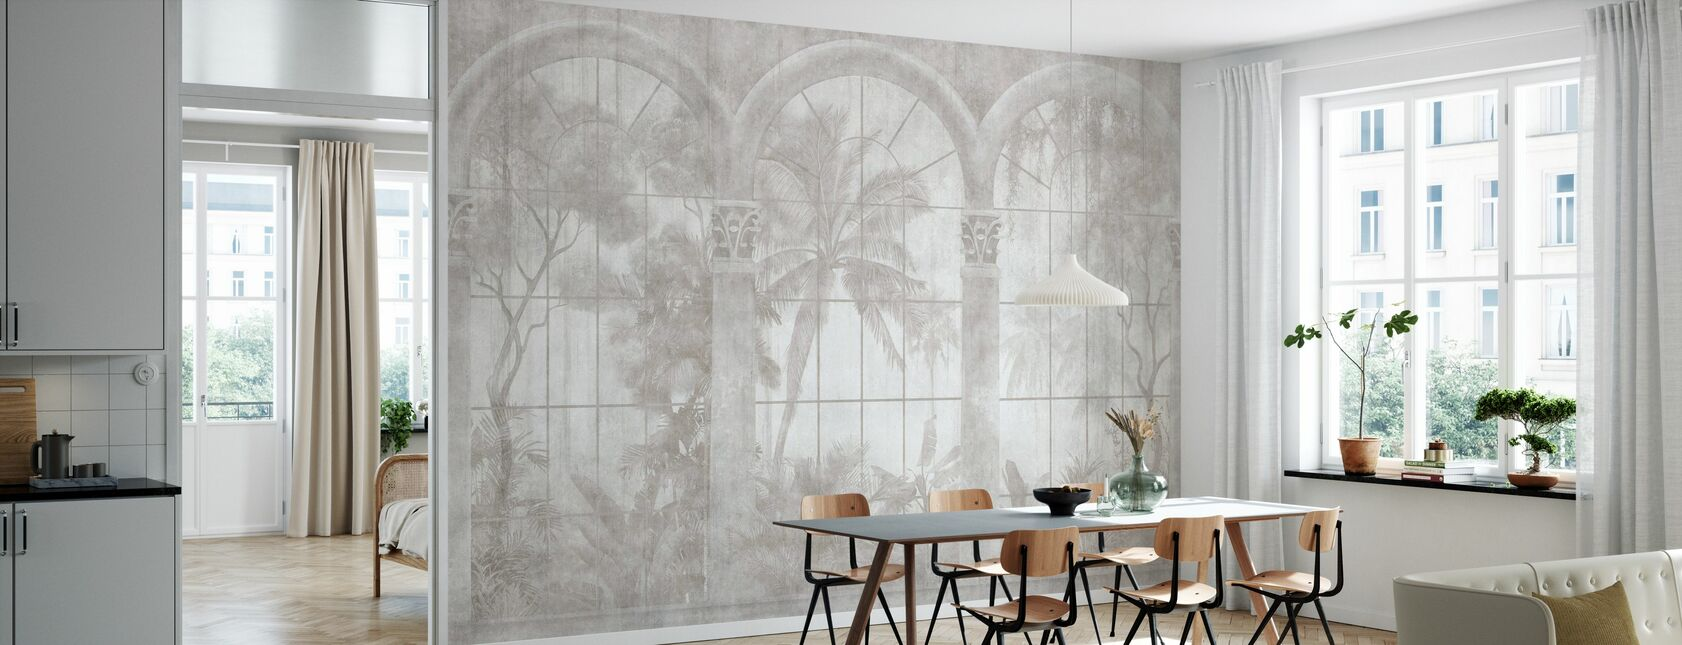 Delicate View - Wallpaper - Kitchen